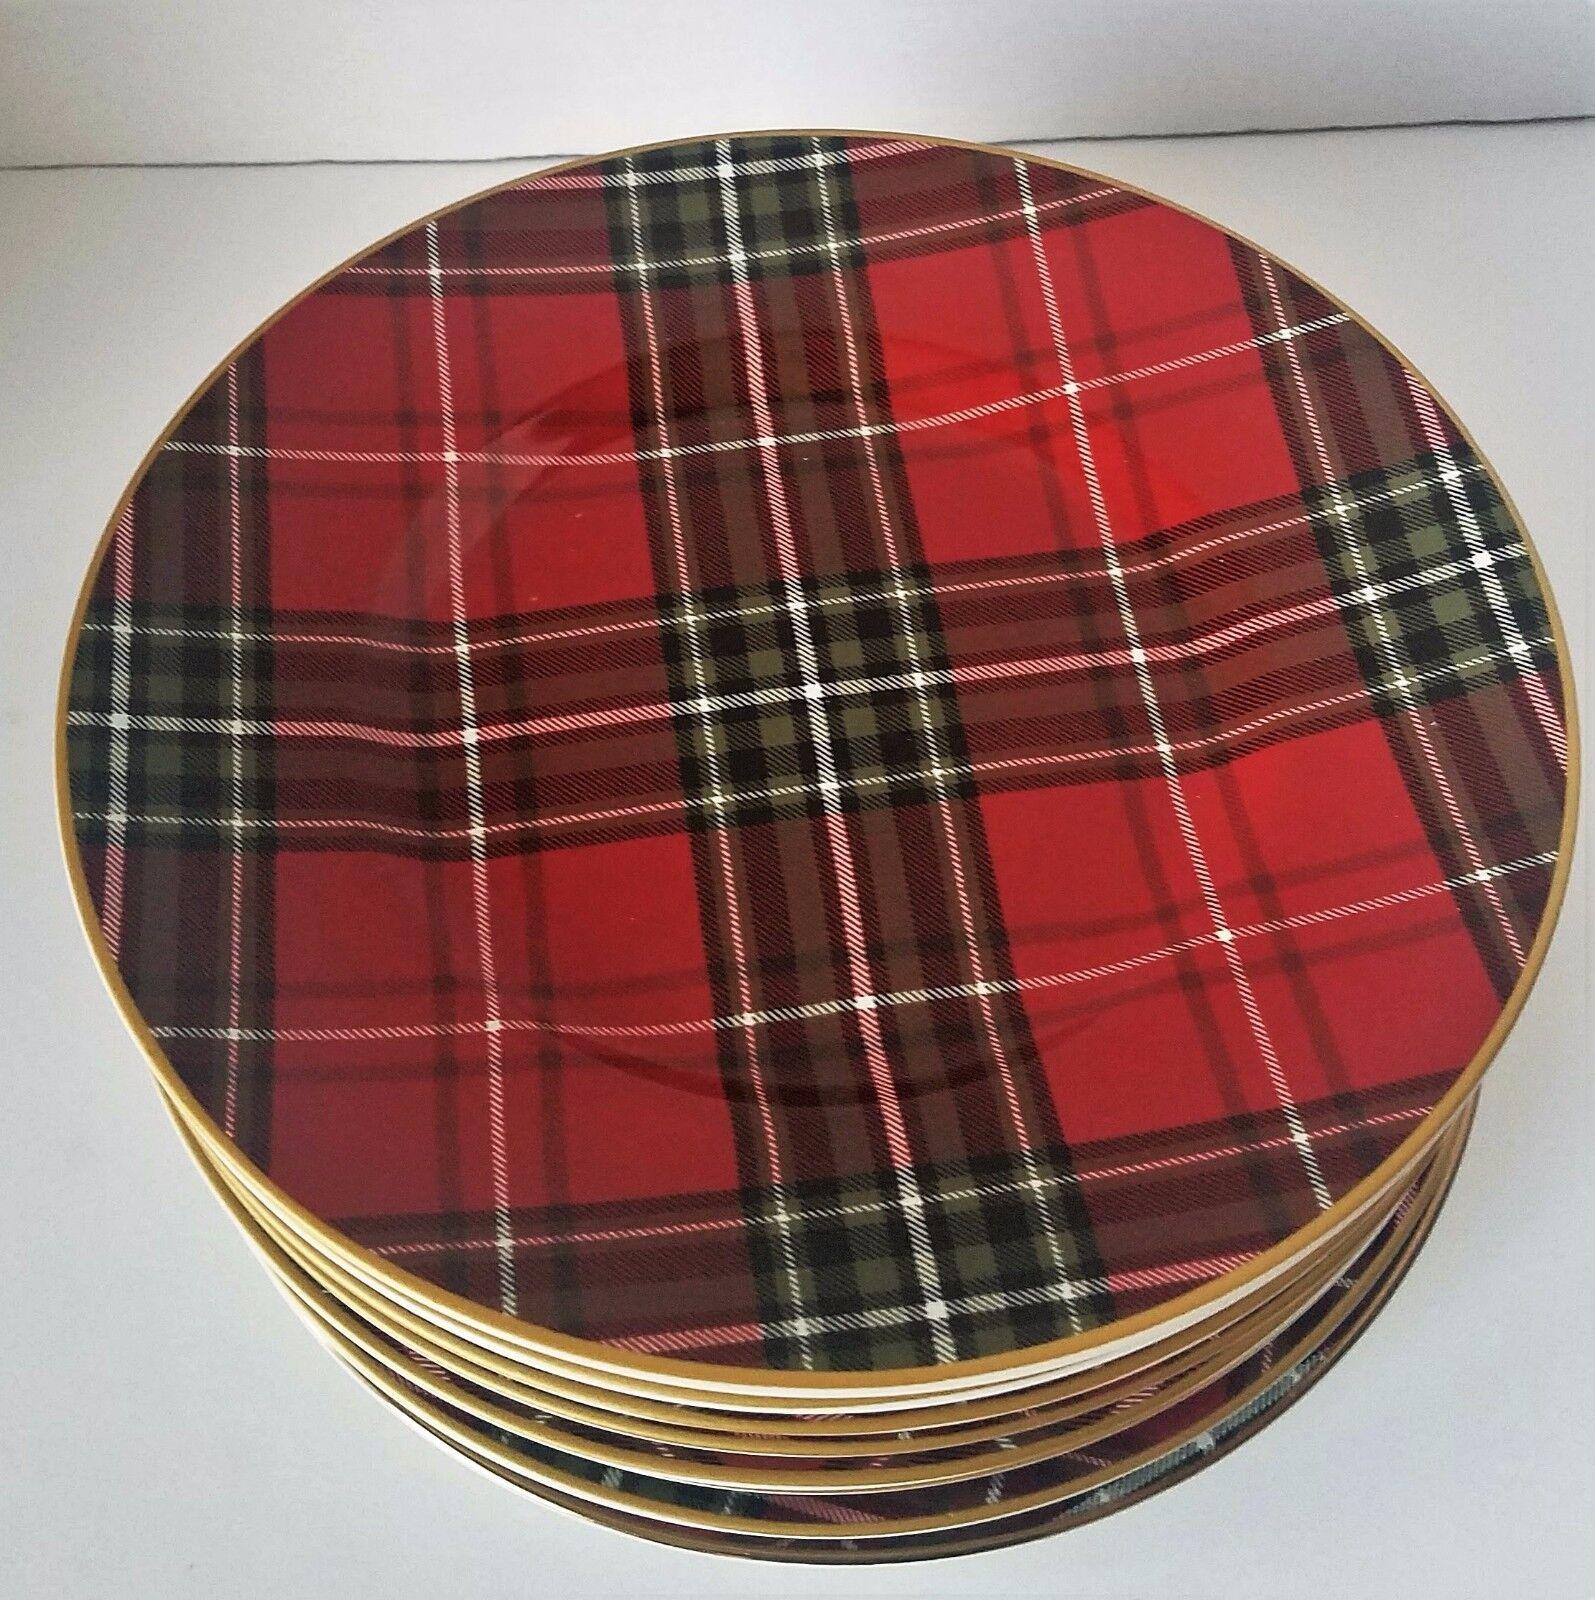 222 Fifth Wexford Plaid rouge Salad Plate Set de 8 NEUF